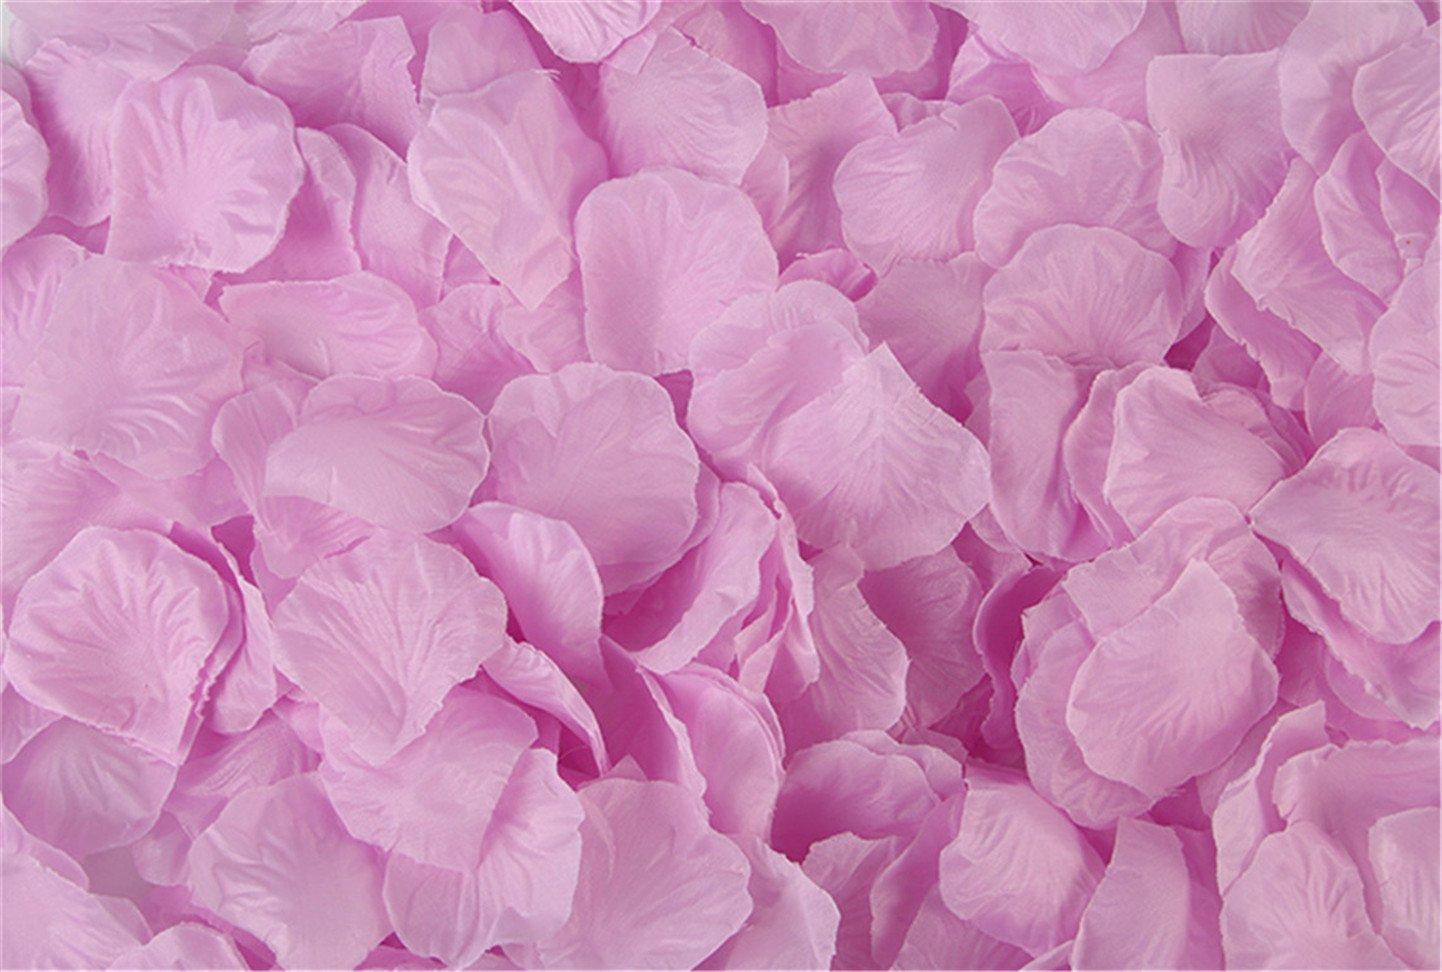 Vivianbuy 2000 PCS Artificial Silk Flower Black Rose Petals for Wedding Party Bridal Decoration